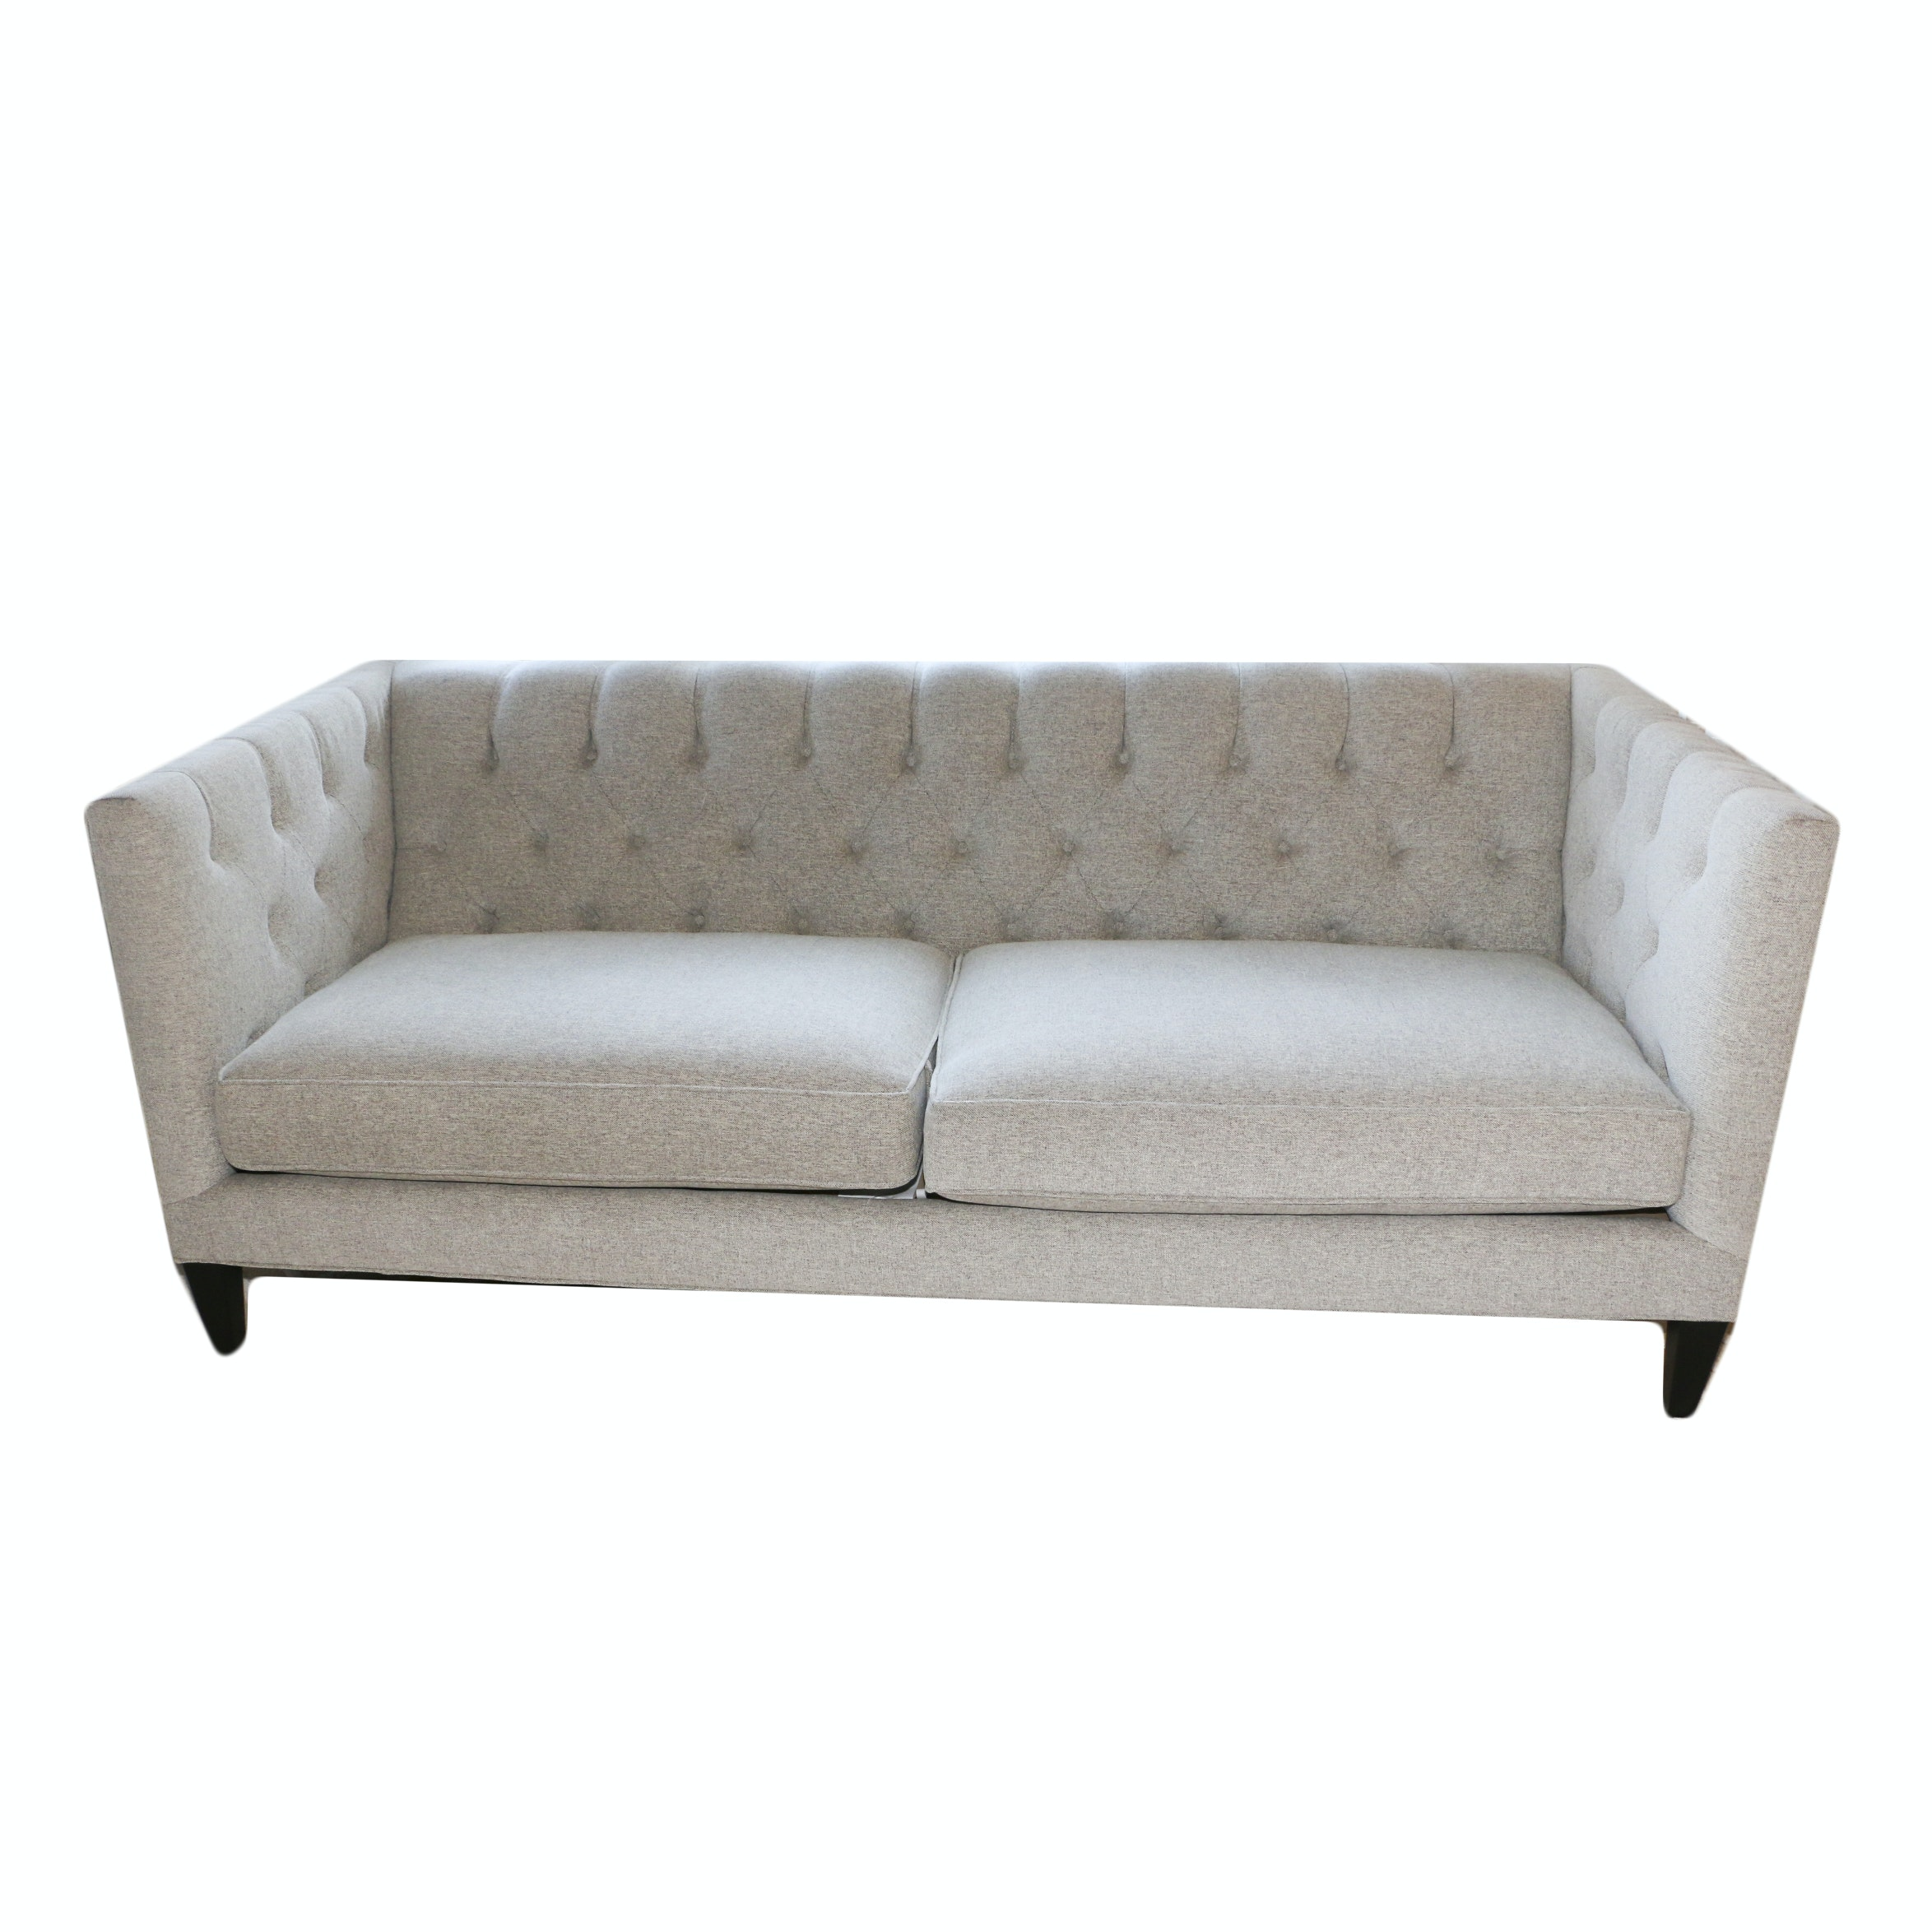 Contemporary Upholstered Tuxedo Sofa